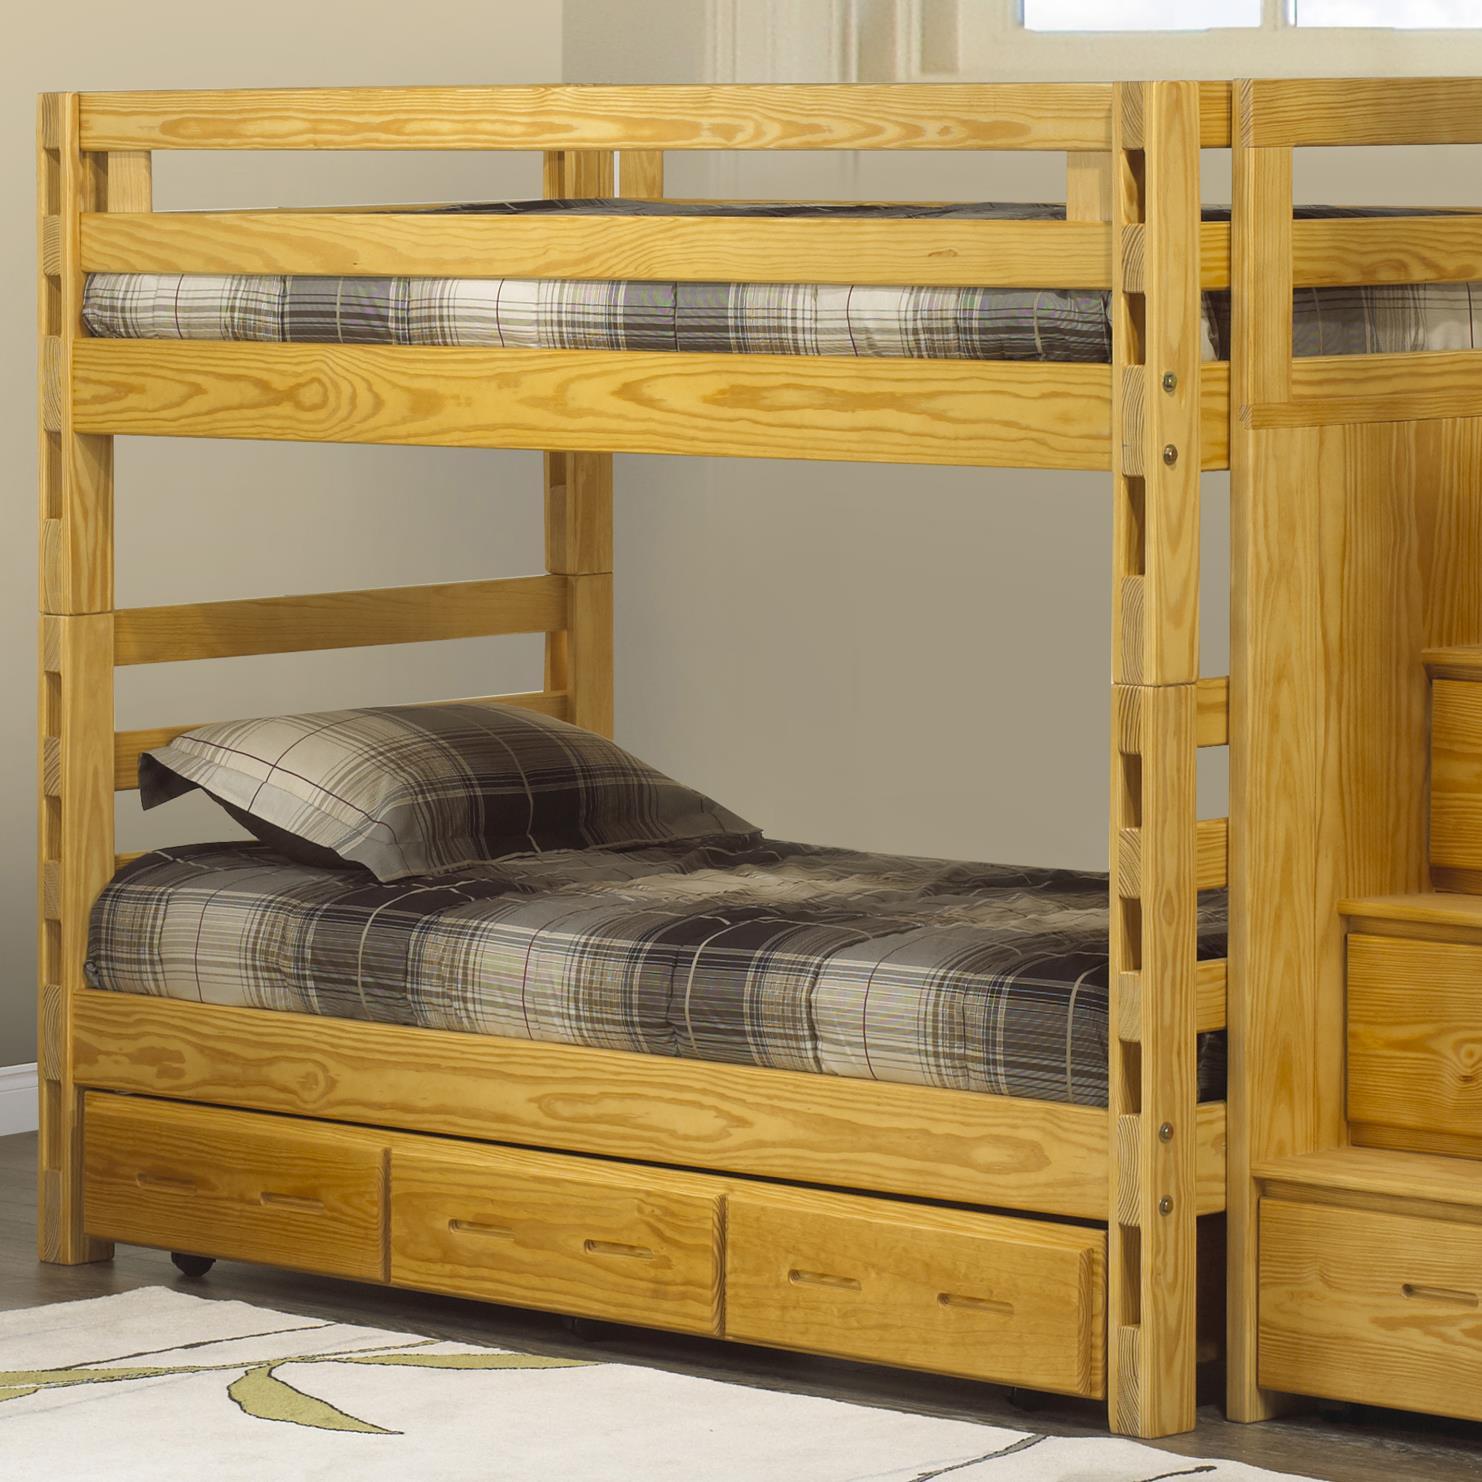 Crate Designs Crate Designs Bedroom Twin Twin Bunkbed W Storage